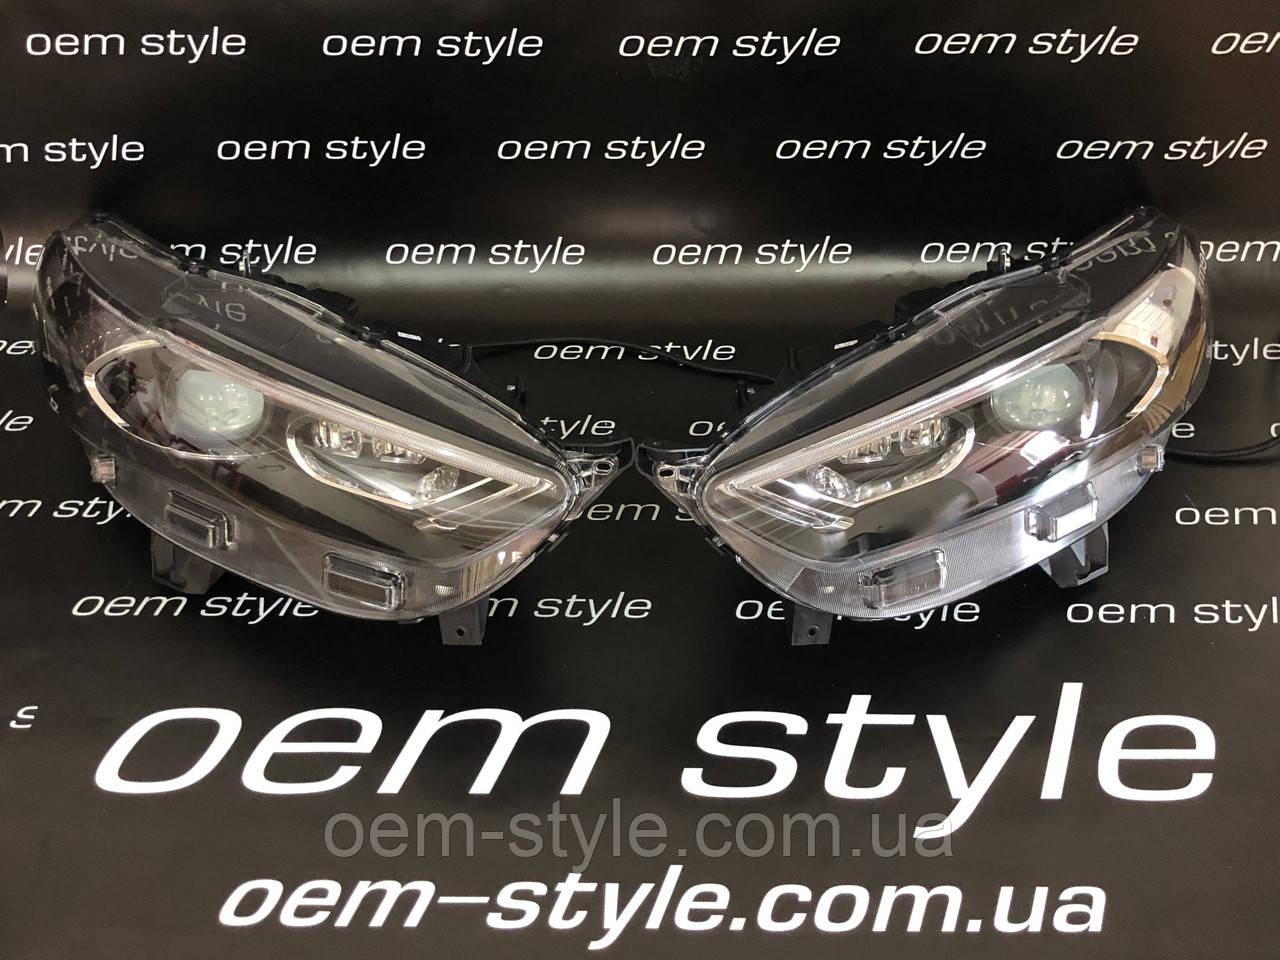 Фари Ford Fusion USA 2012-2016 Style 17 ( XENON)